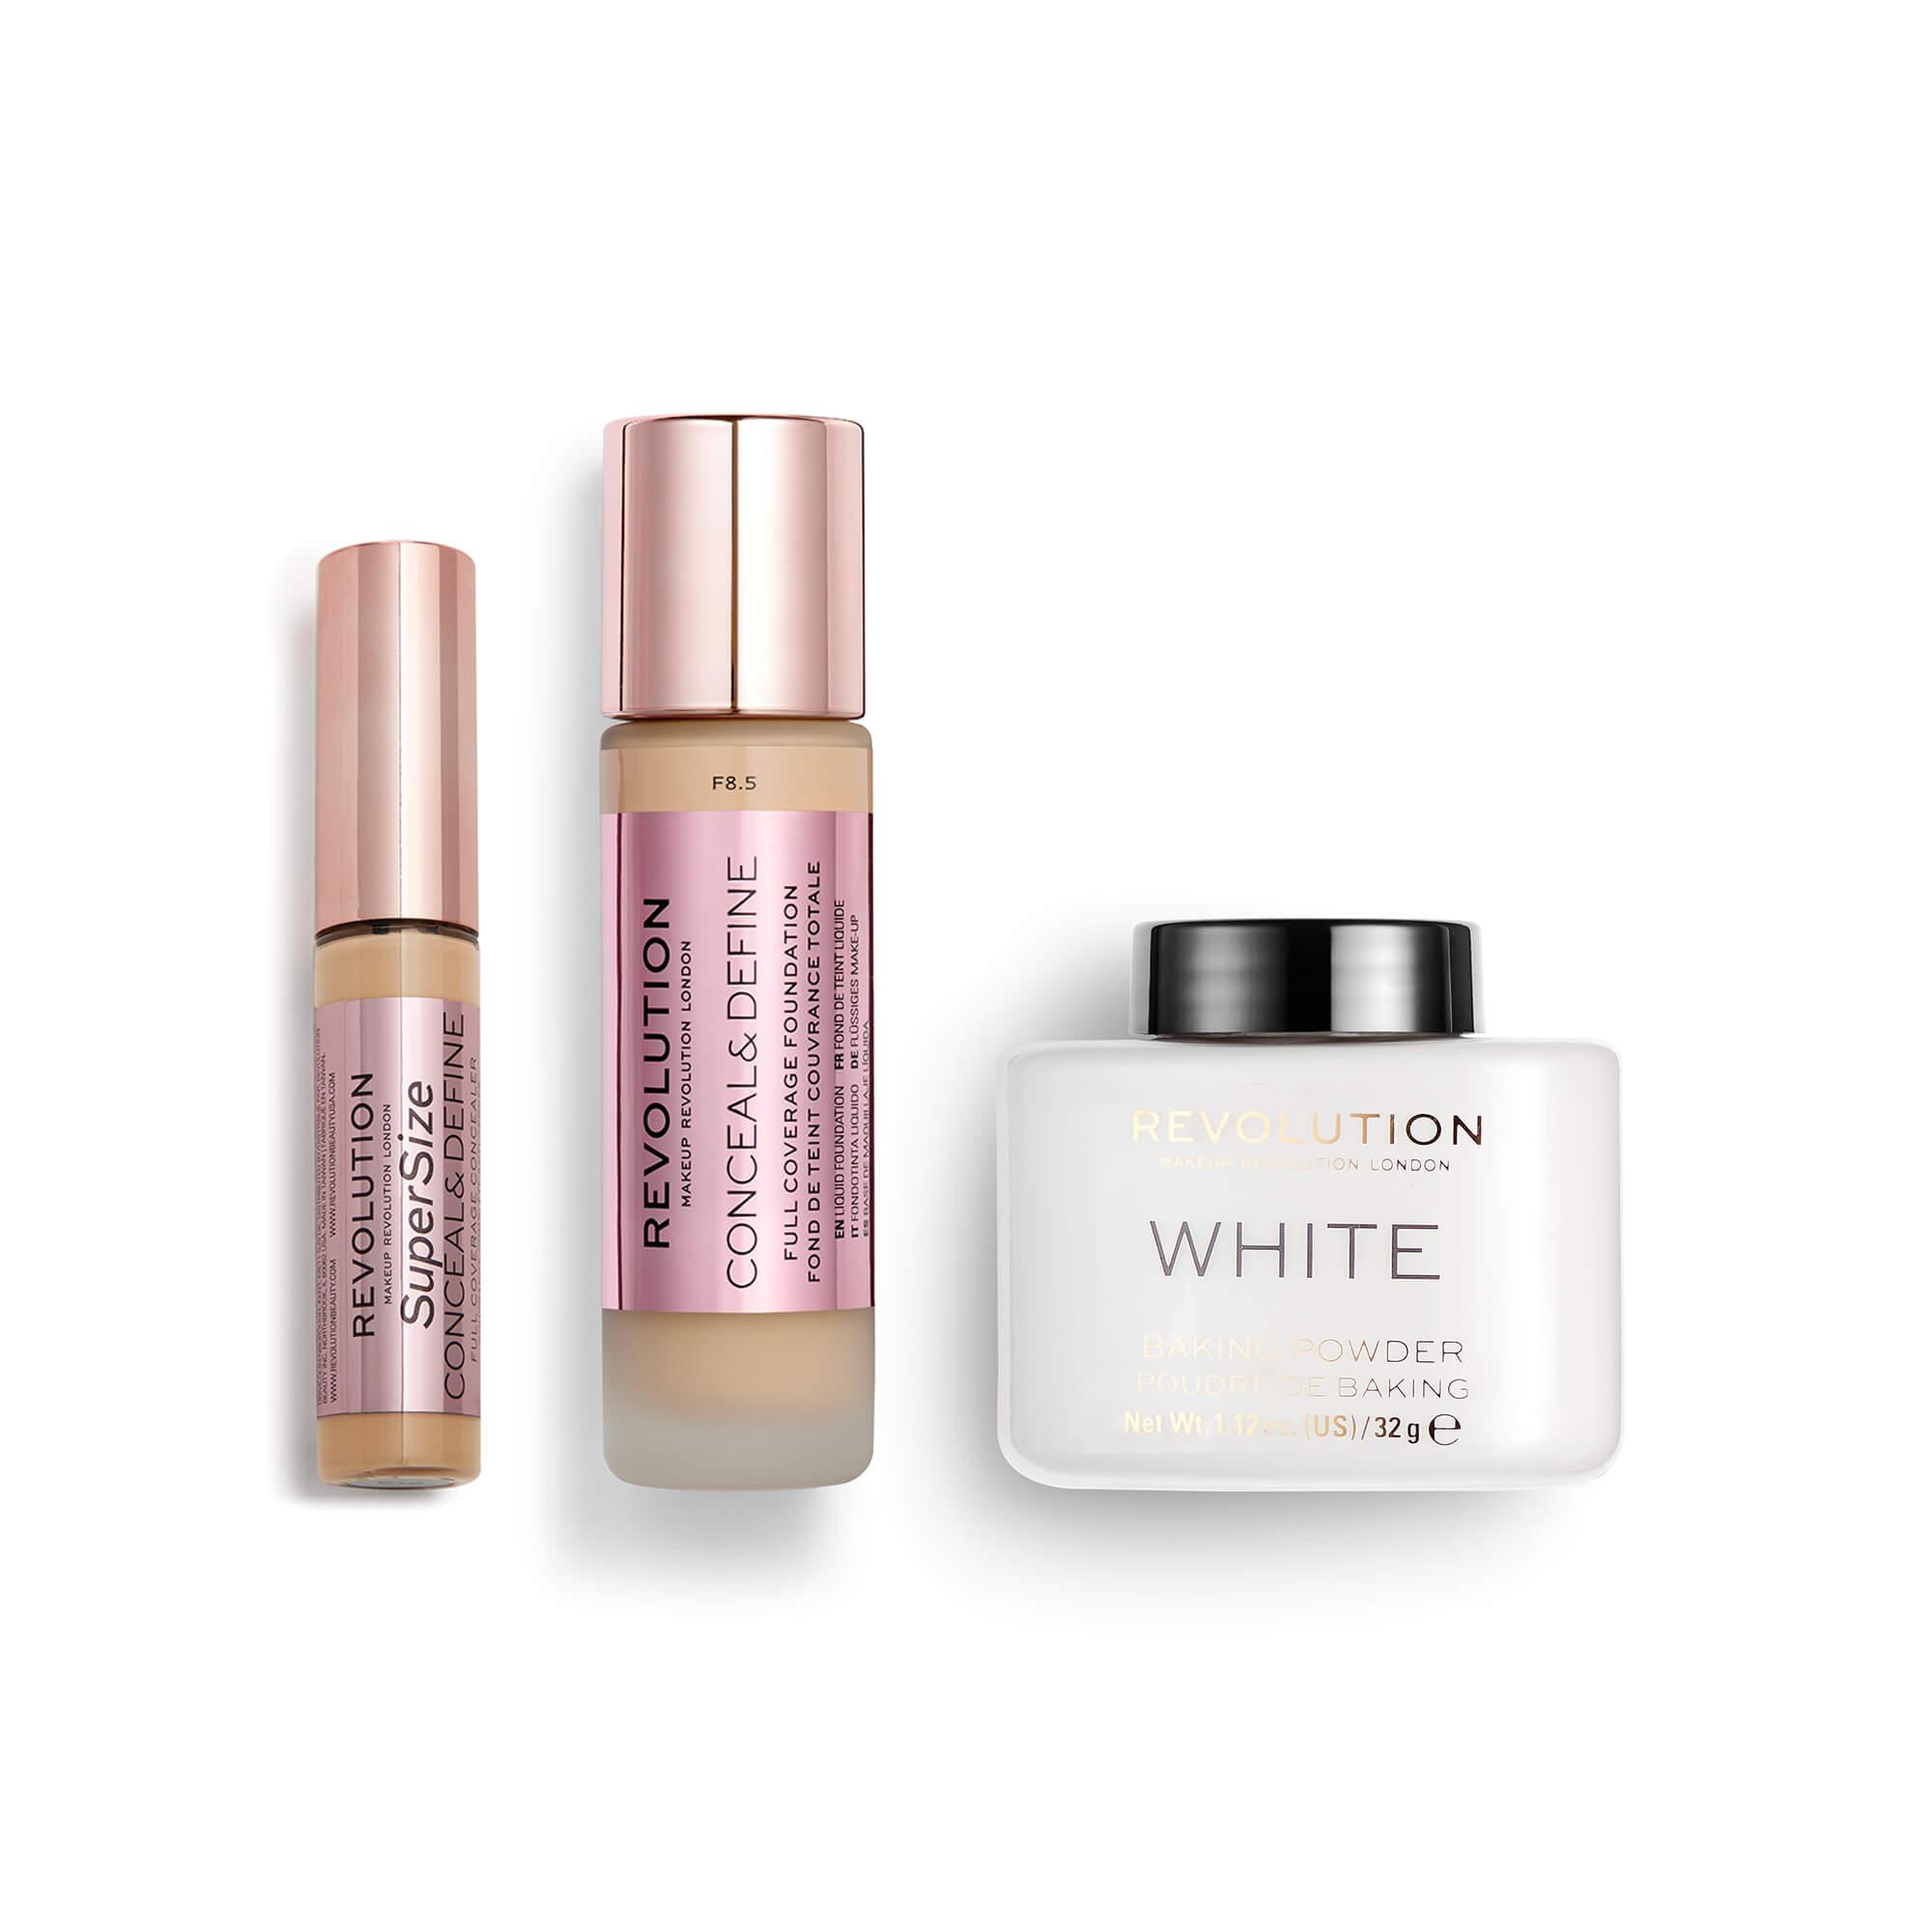 Build your own bundle including a Revolution Beauty foundation, concealer & baking powder